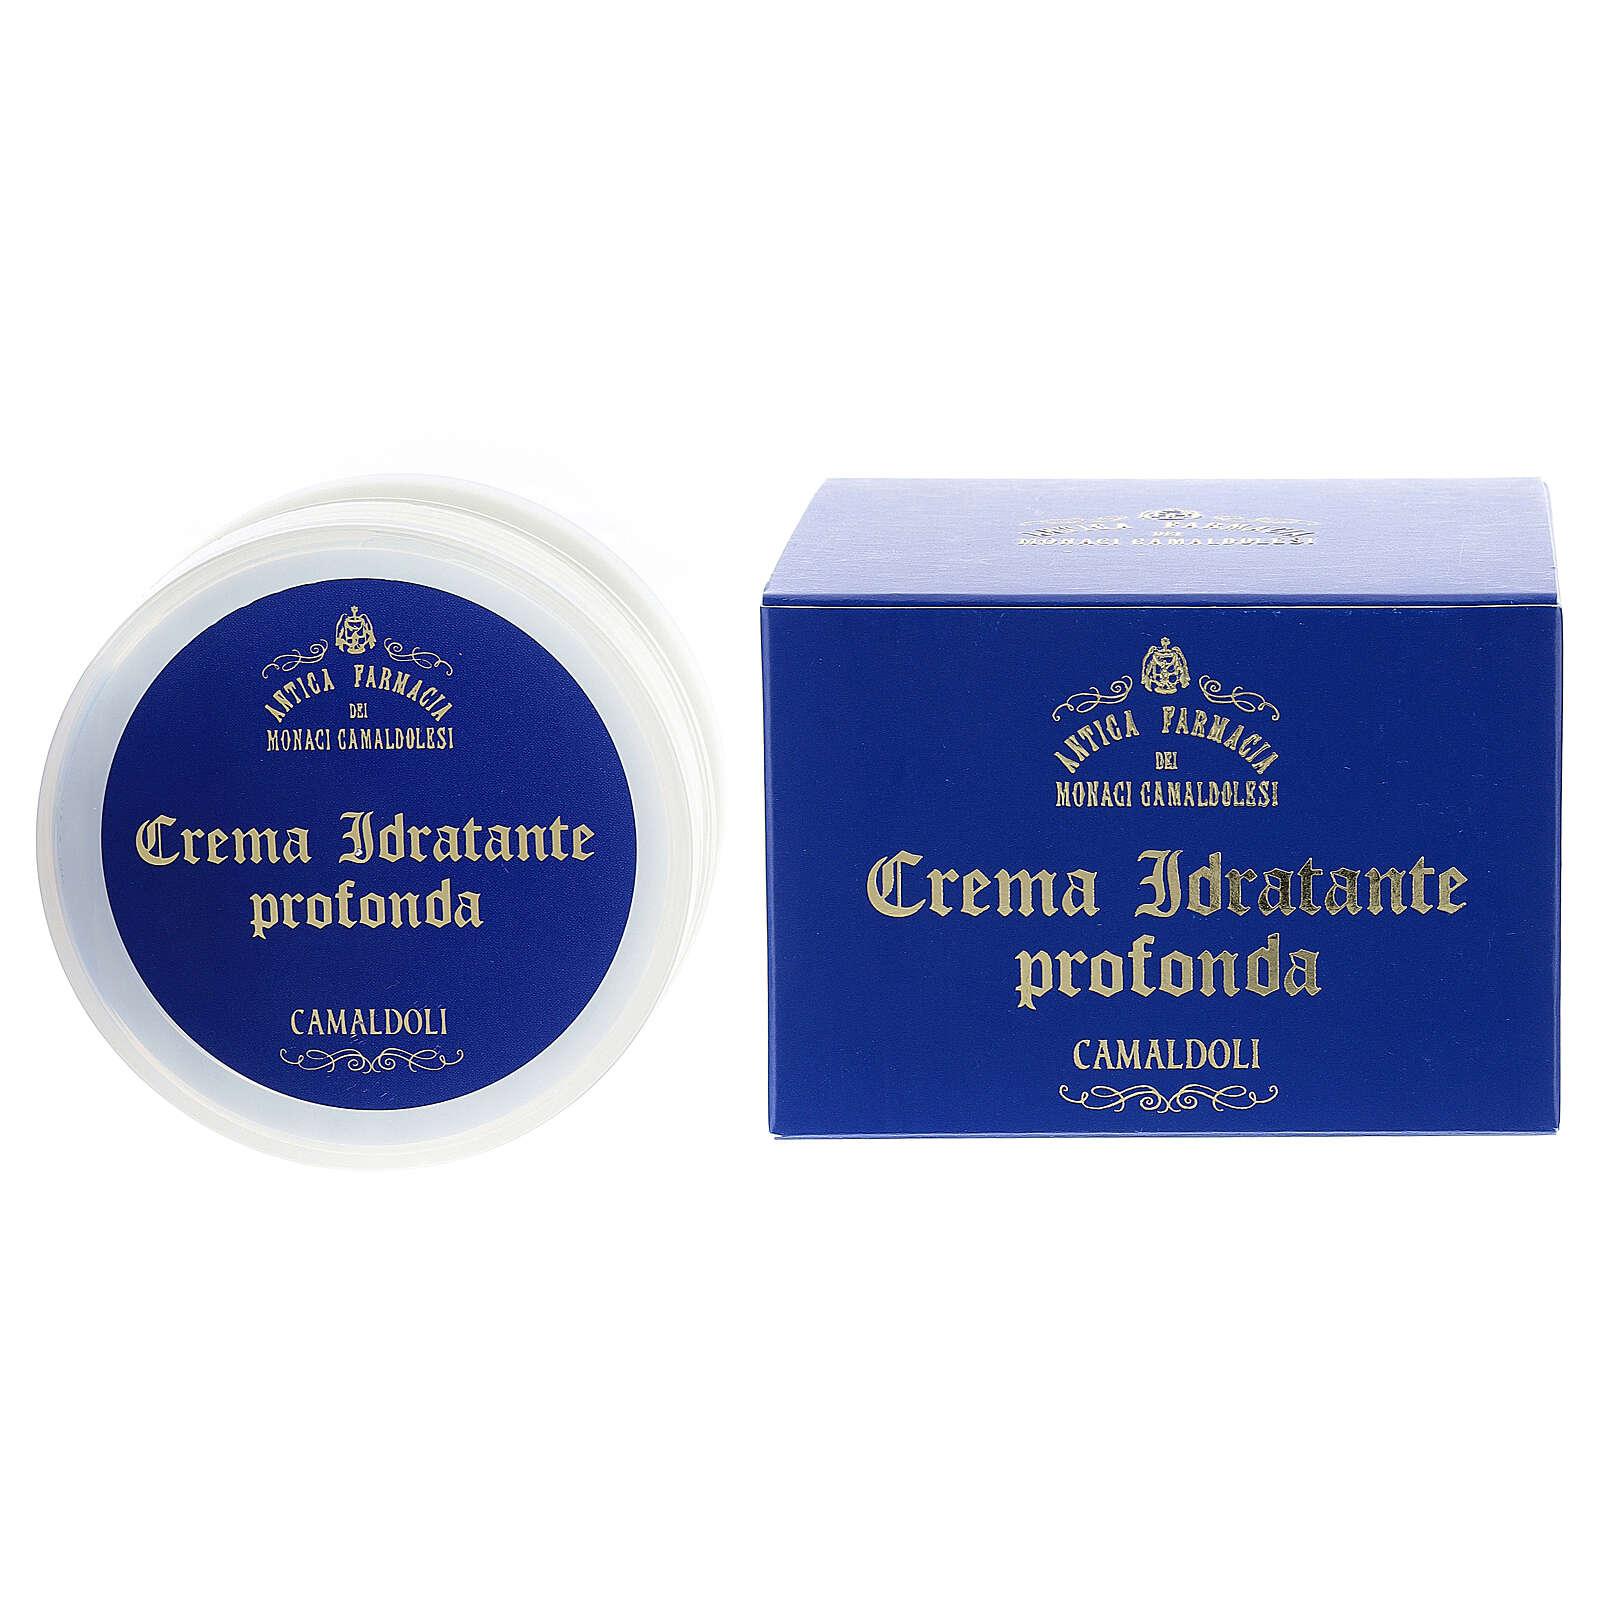 Crema idratante profonda Naturale 50 ml Camaldoli 4